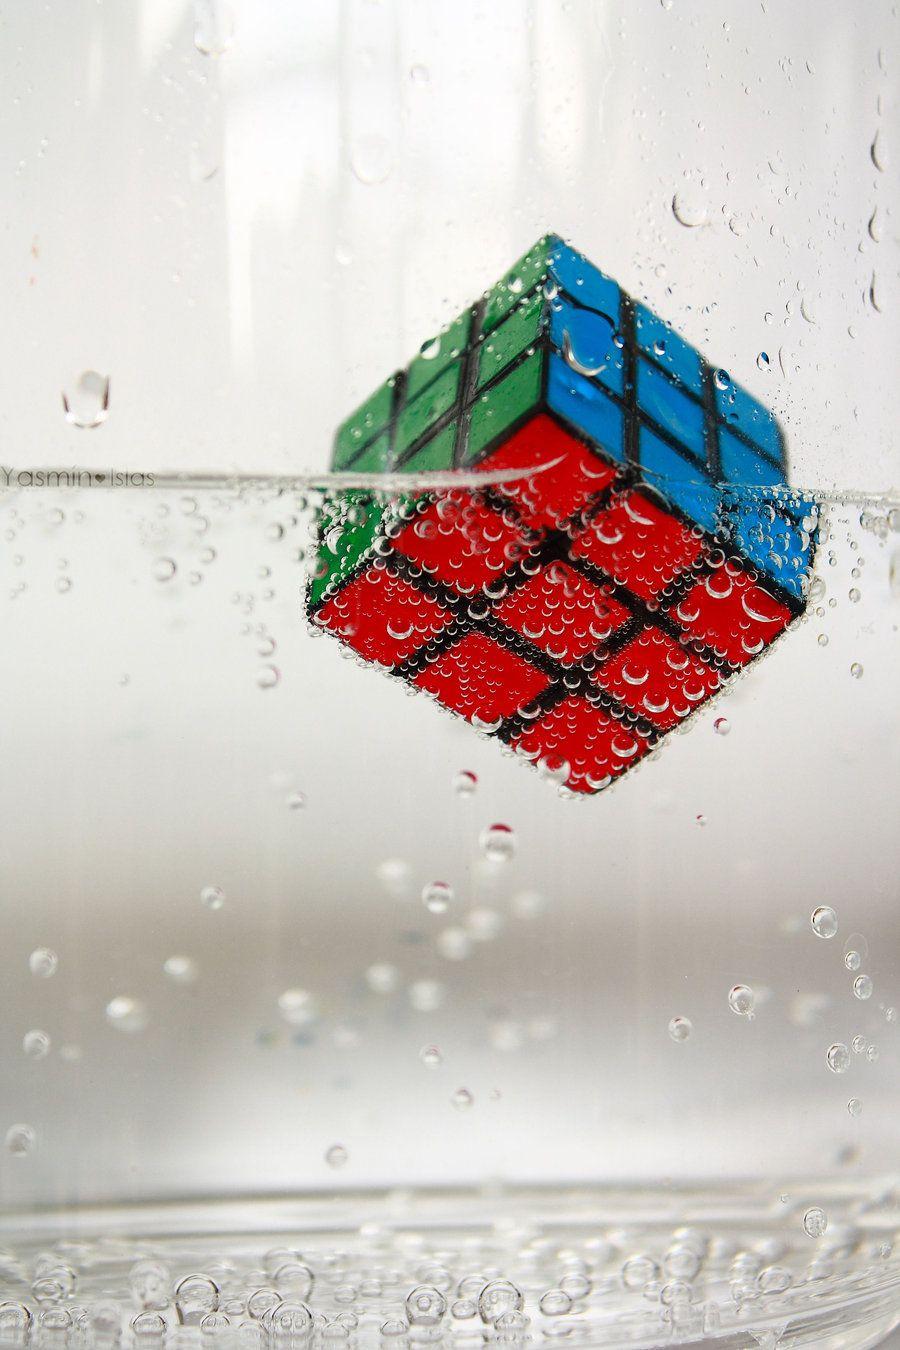 Rubik By Yasislas On Deviantart Rubiks Cube Rubix Cube Rubiks Cube Algorithms